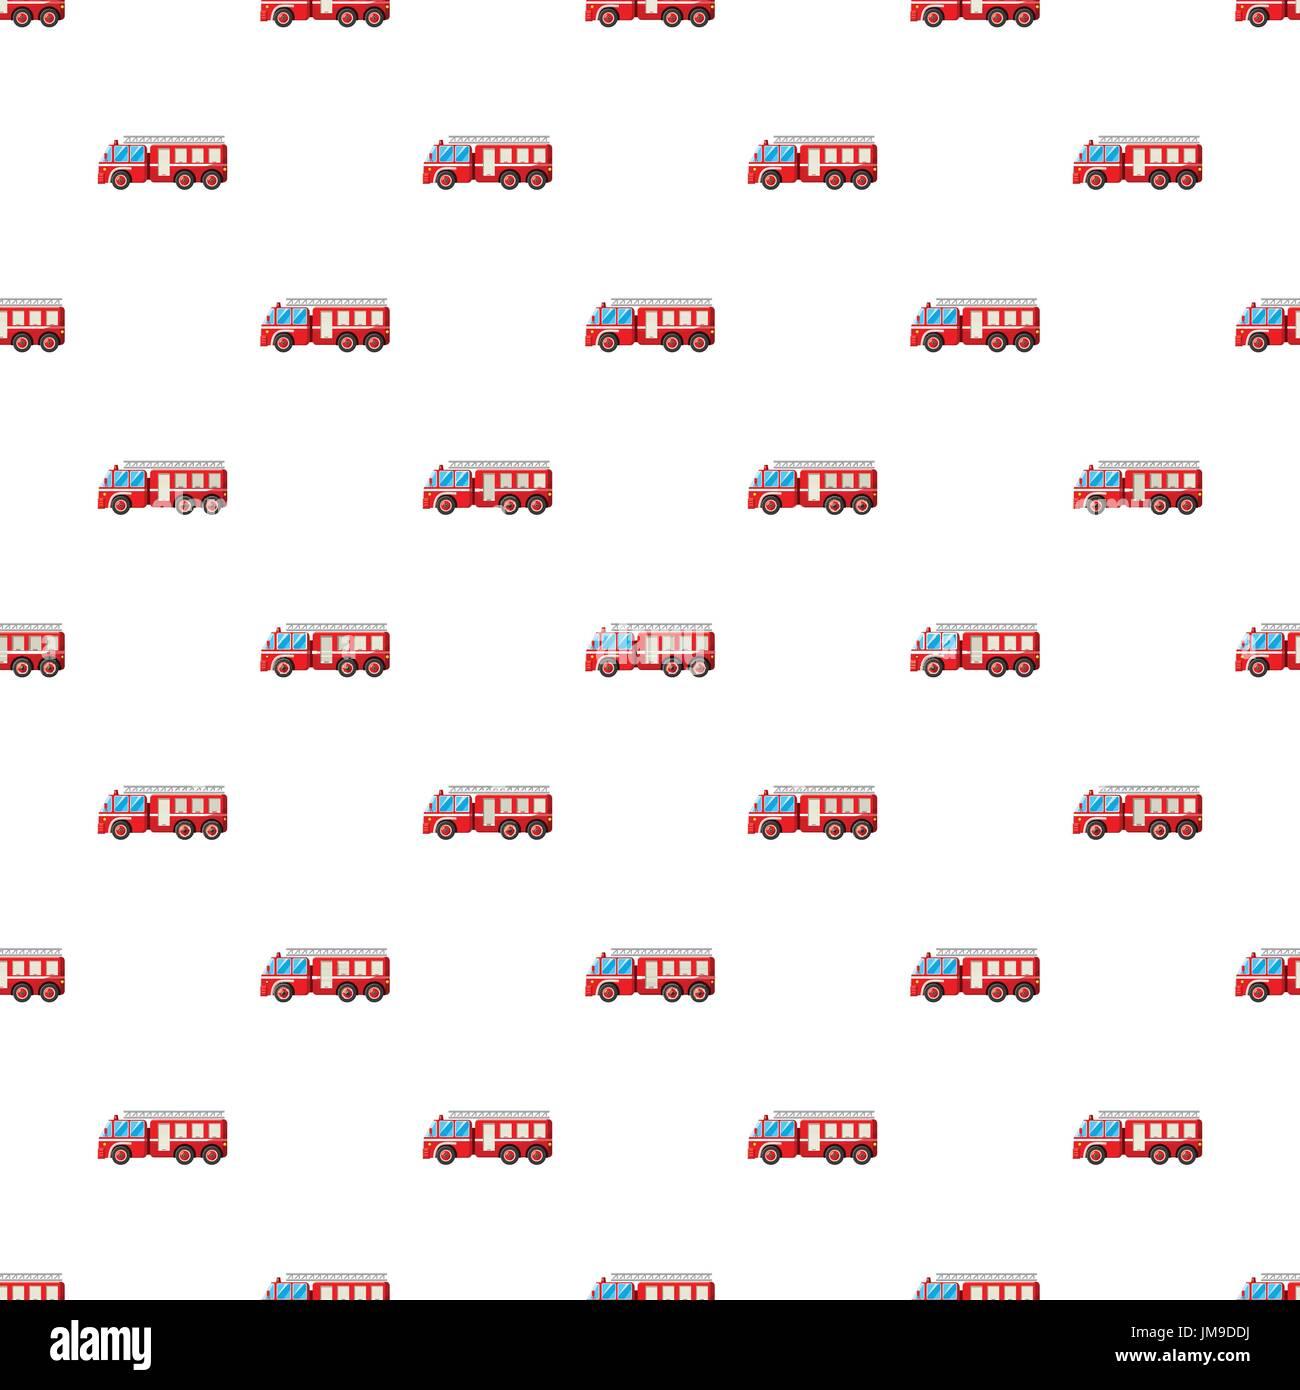 fire truck pattern stock vector art illustration vector image